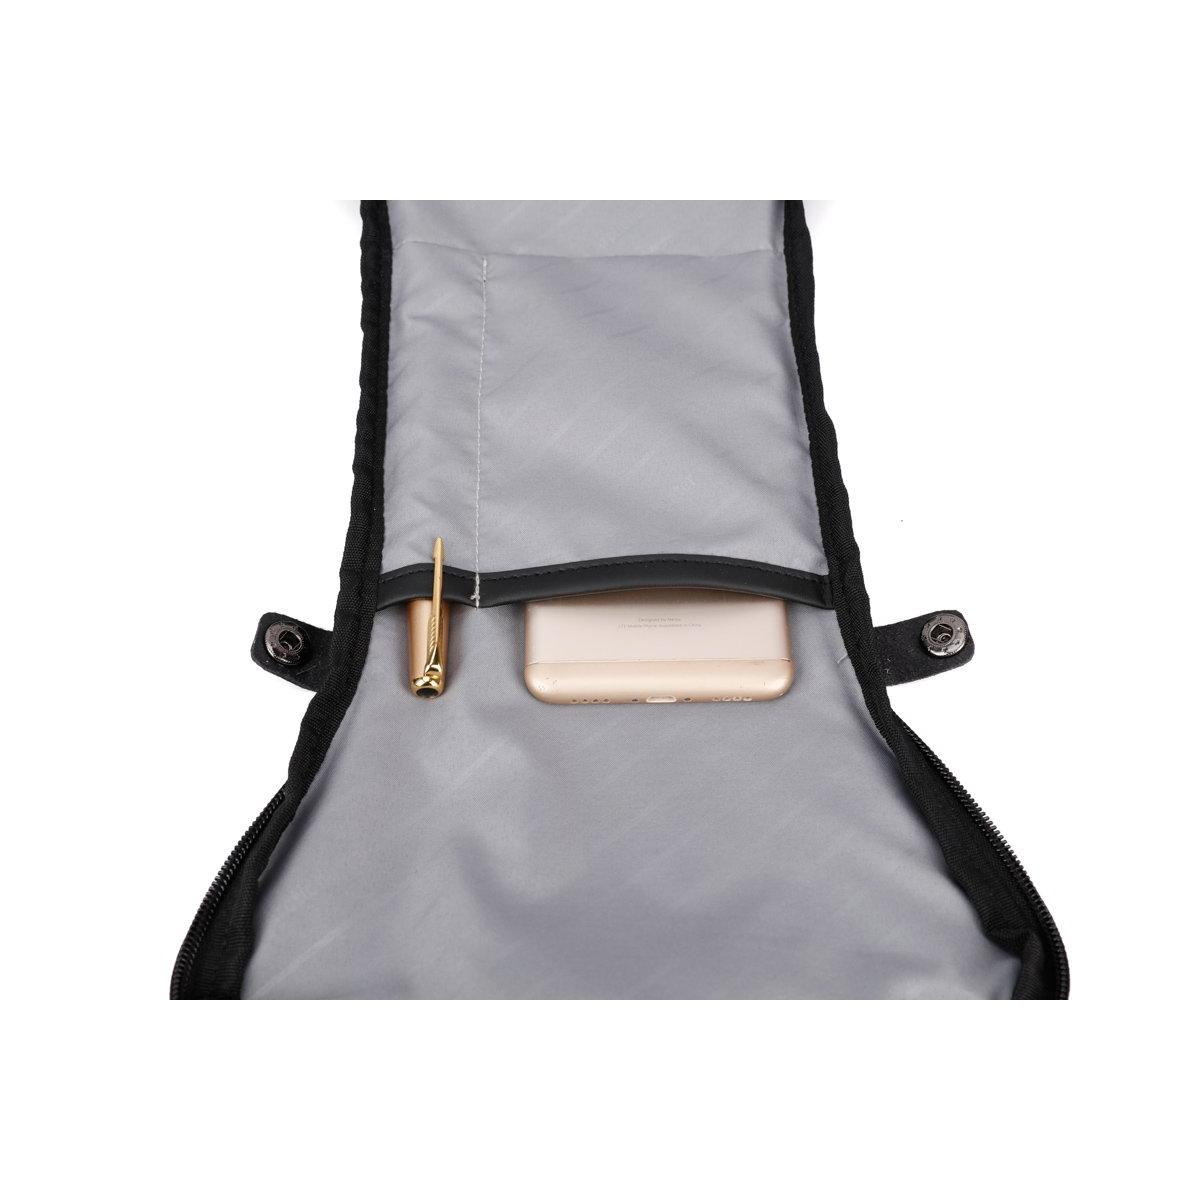 6410c28509 ARCTIC HUNTER τσάντα crossbody XB00046-LG